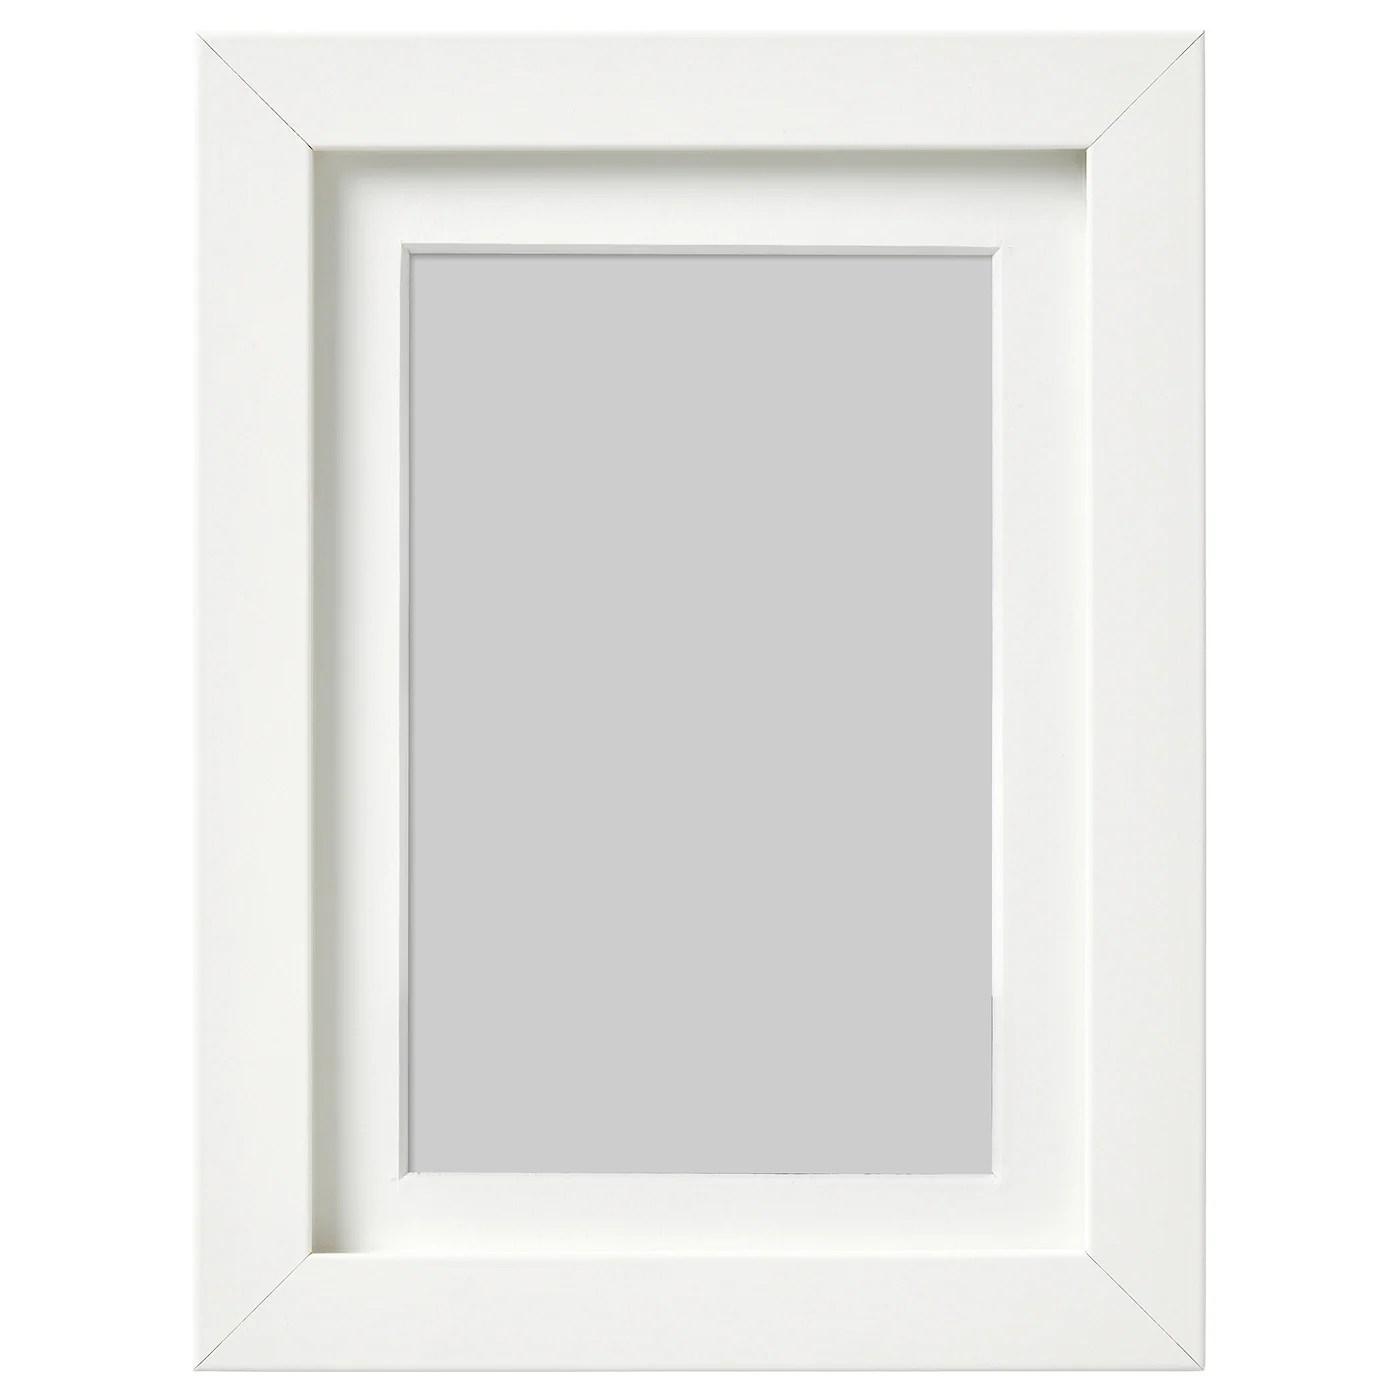 ribba frame white 18x24 cm